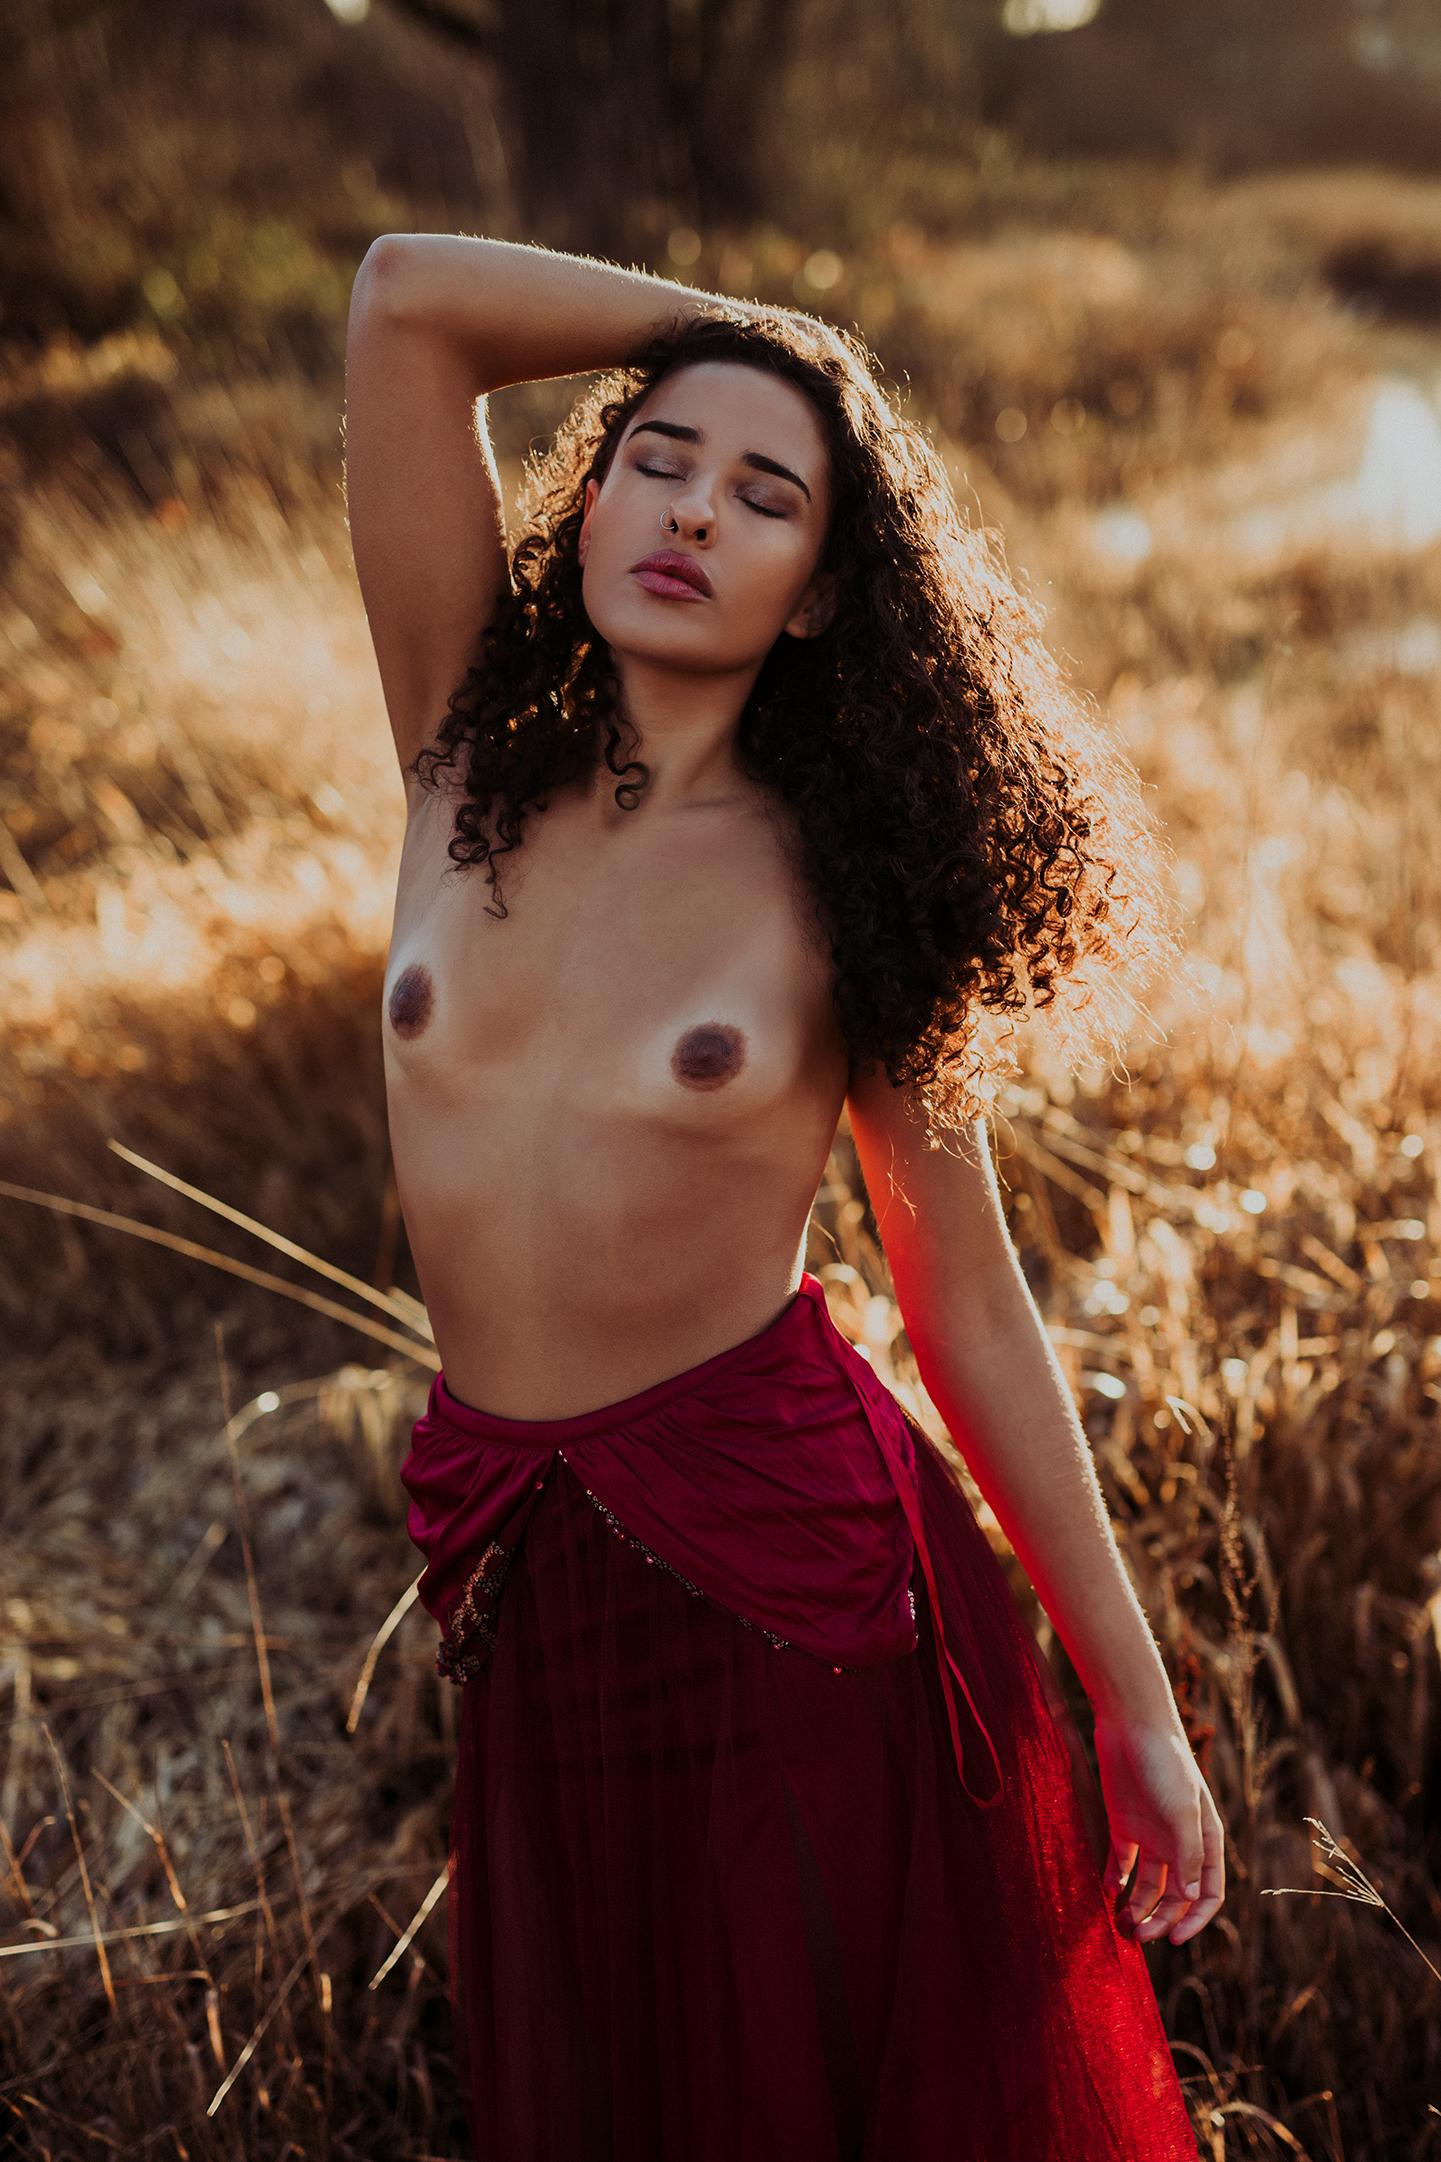 victoria-bc-outdoor-boudoir-photography-4.jpg